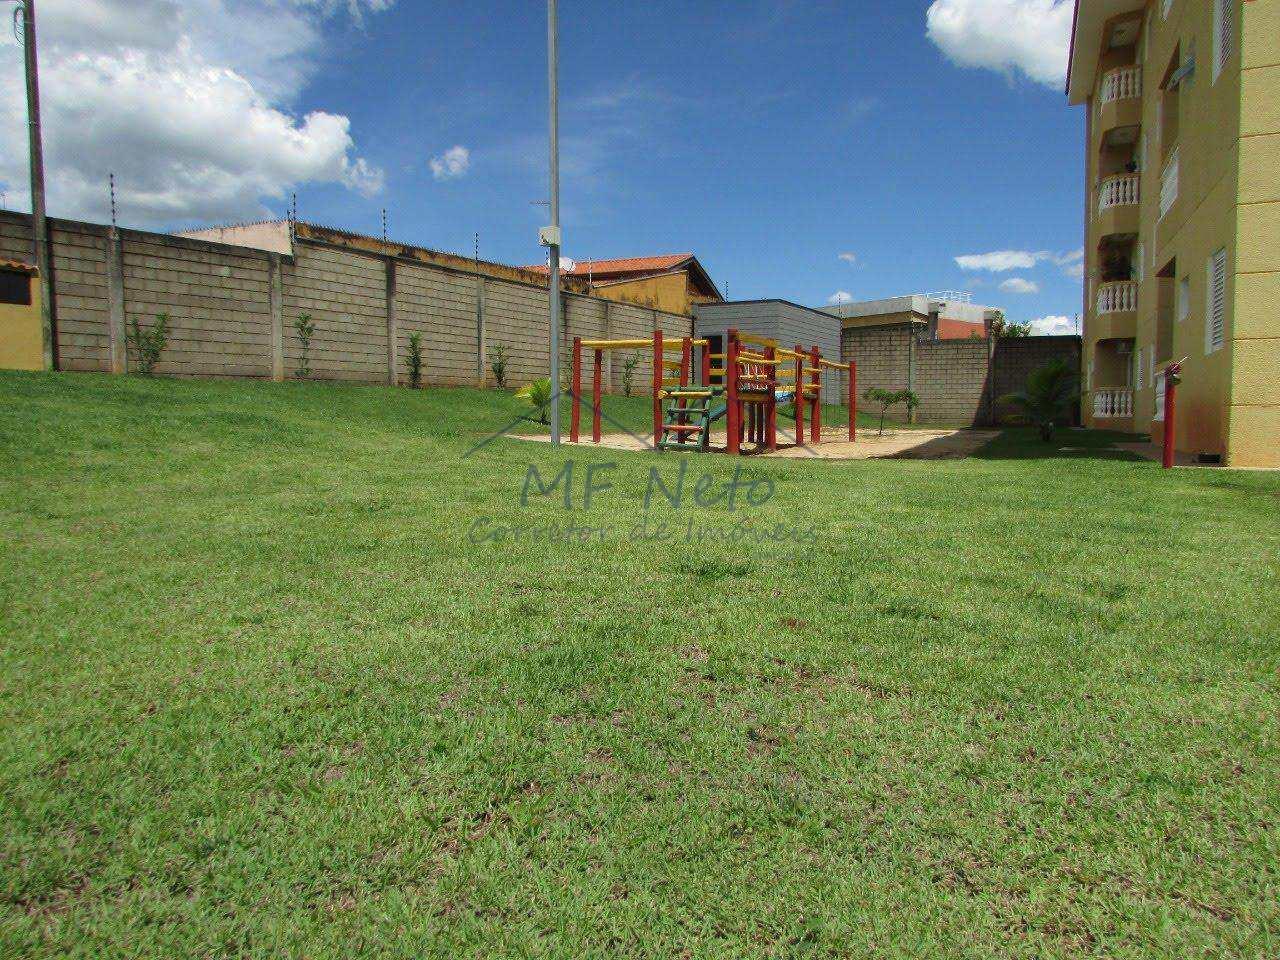 Apartamento com 2 dorms, Jardim Europa, Pirassununga - R$ 185 mil, Cod: 100700